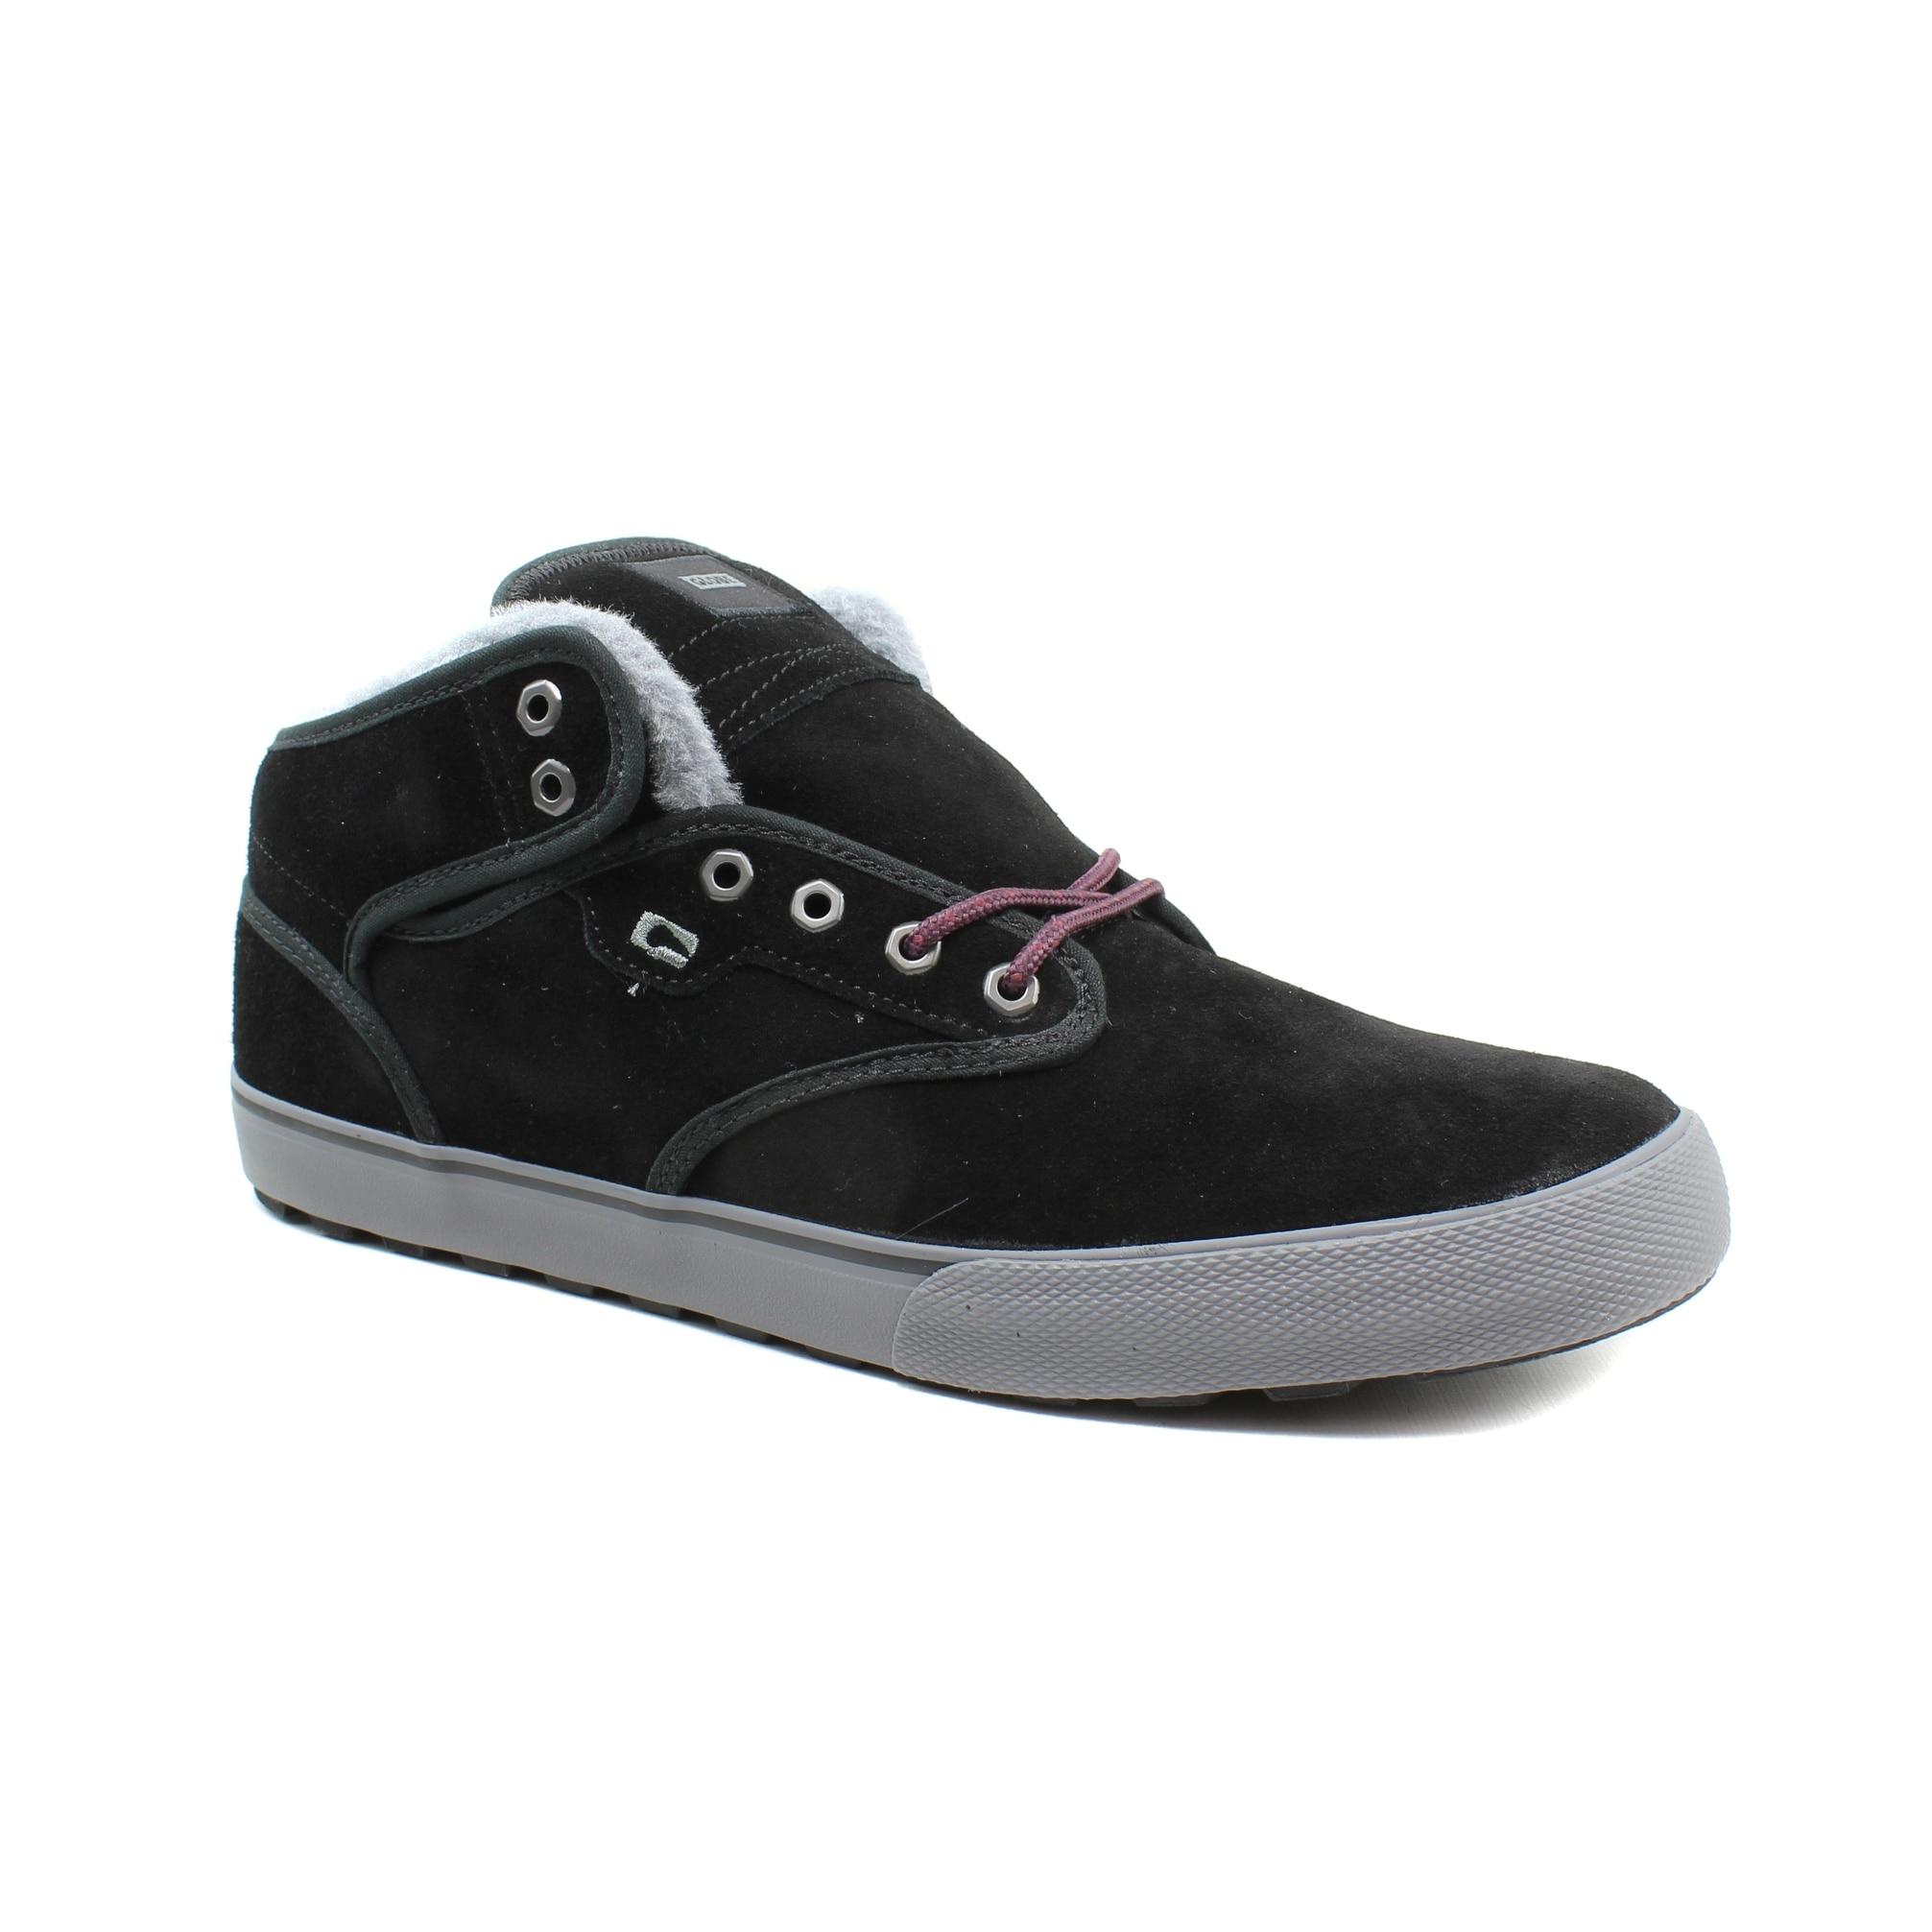 1685373e5d1 Shop Globe Mens Motley Mid Black Skateboarding Shoes Size 9 - On ...